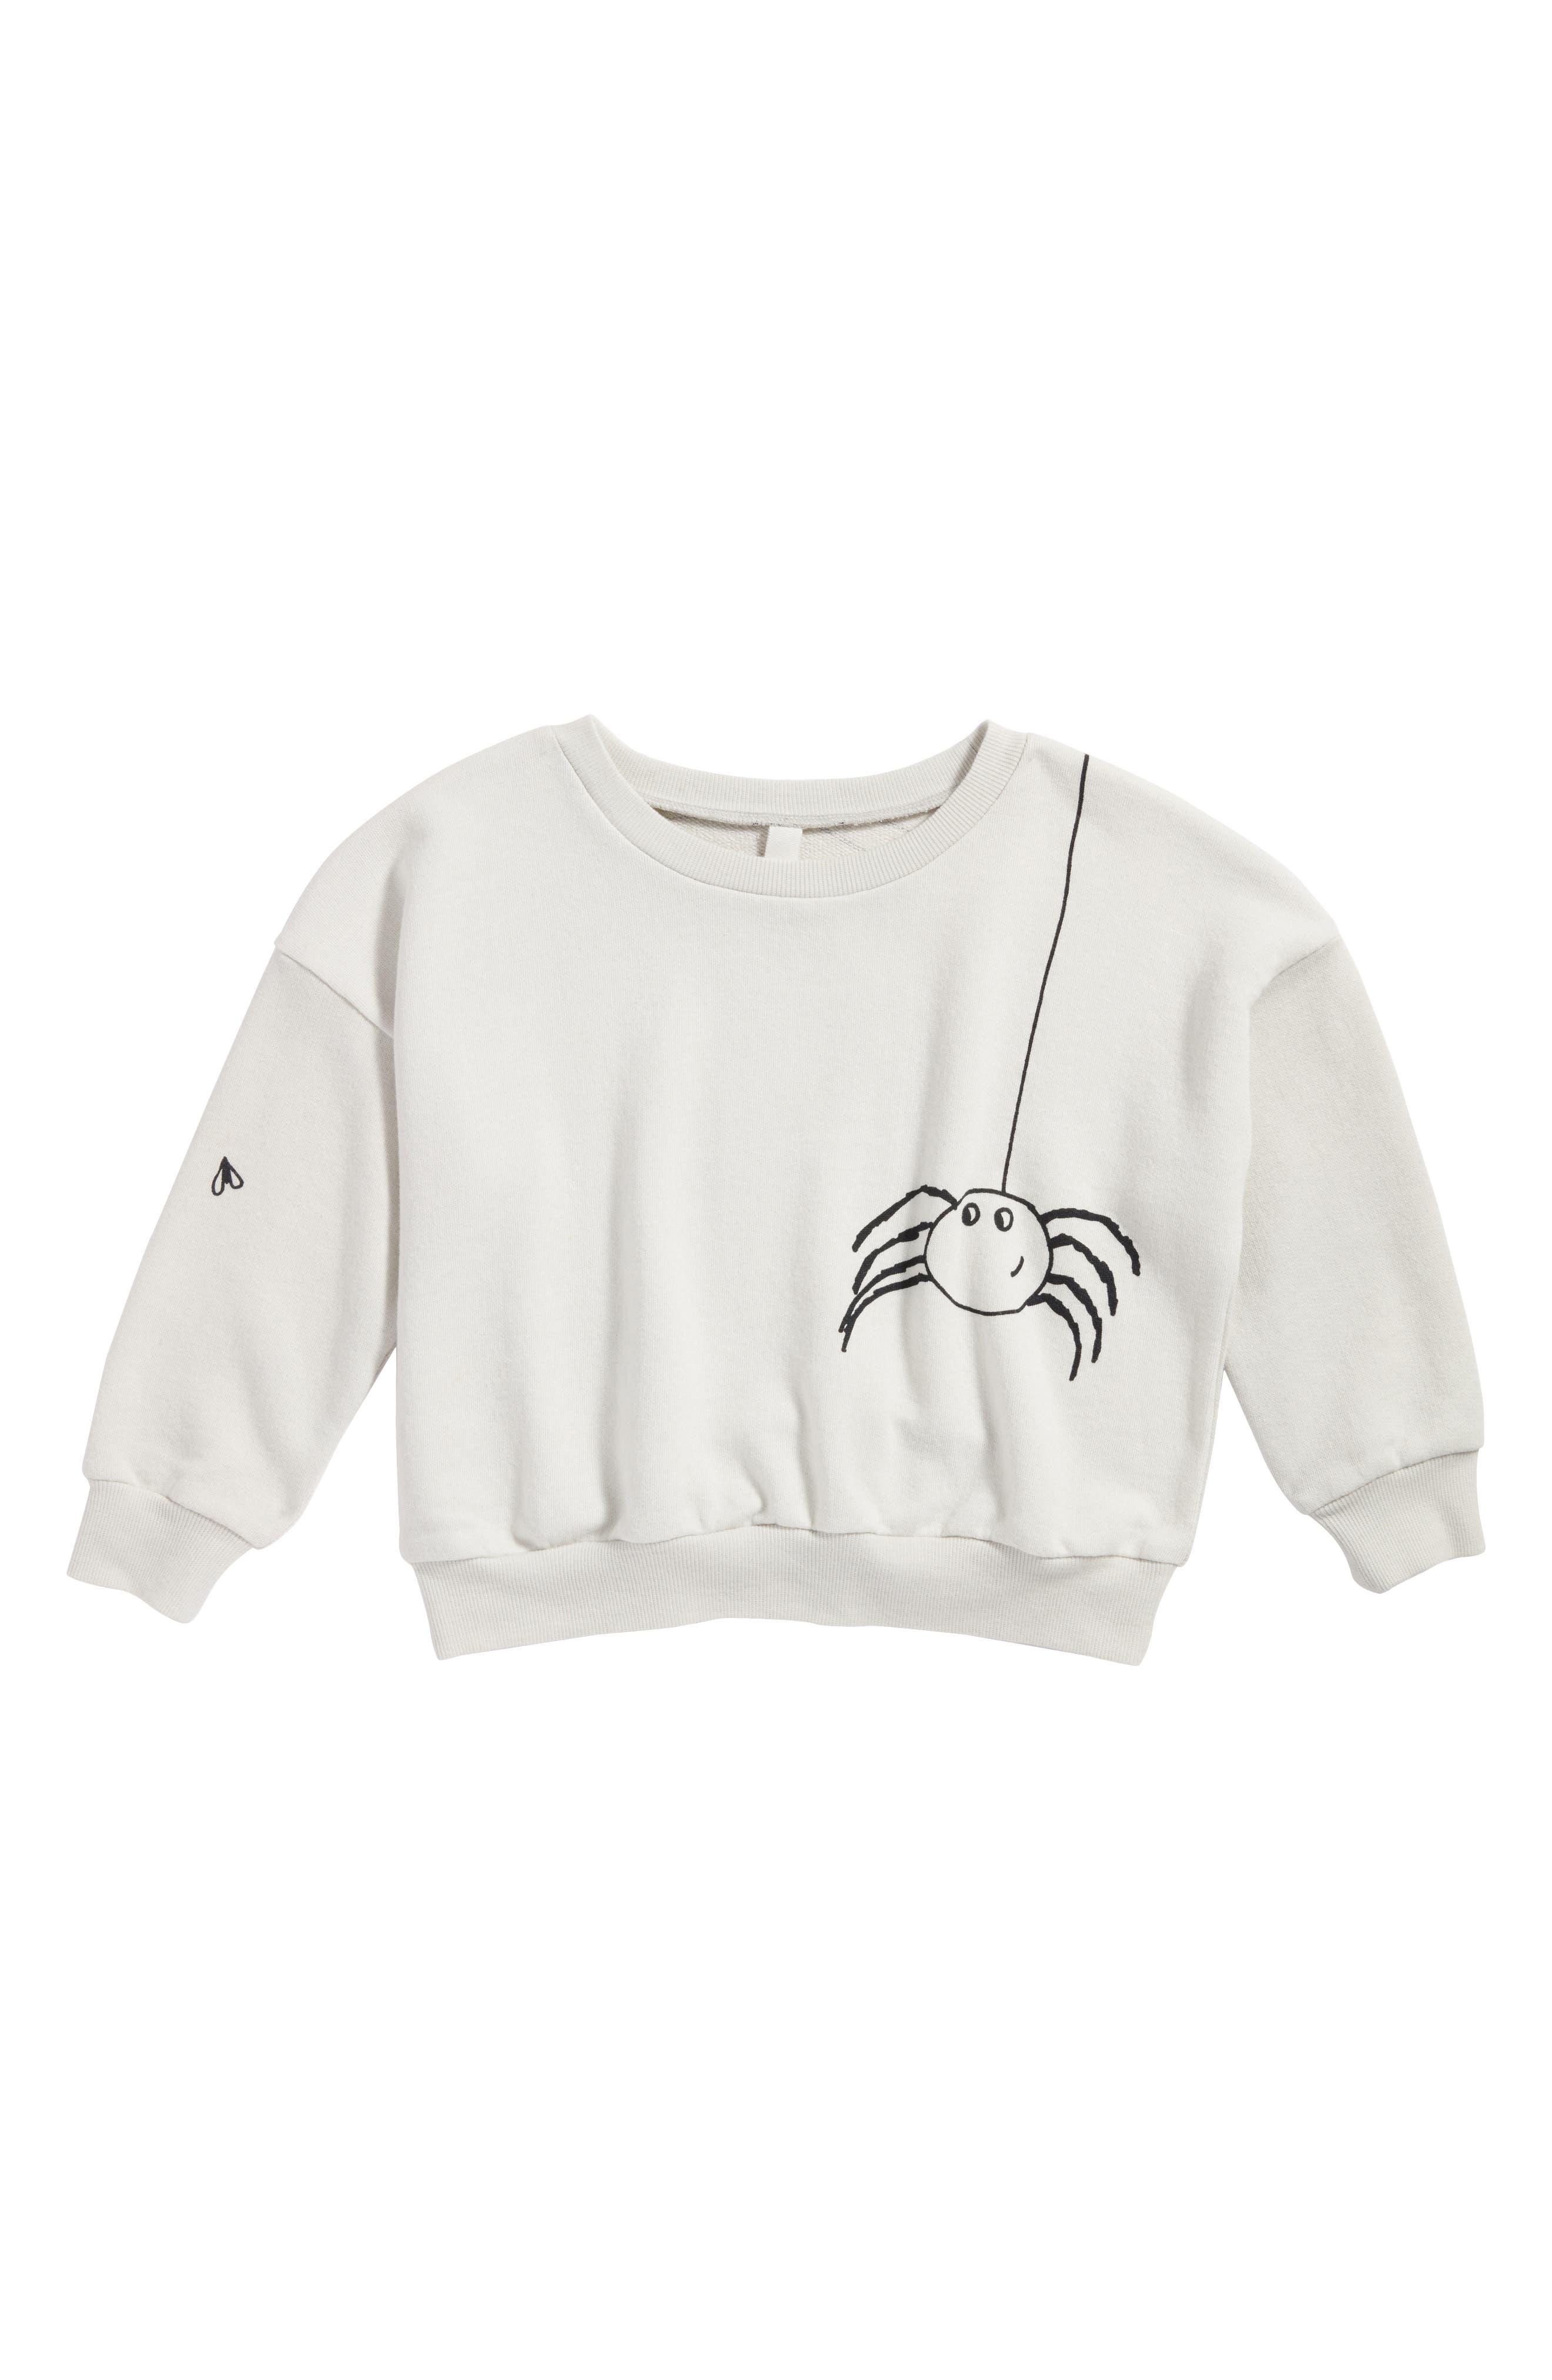 Graphic Sweatshirt,                             Main thumbnail 1, color,                             Grey Lunar Spider